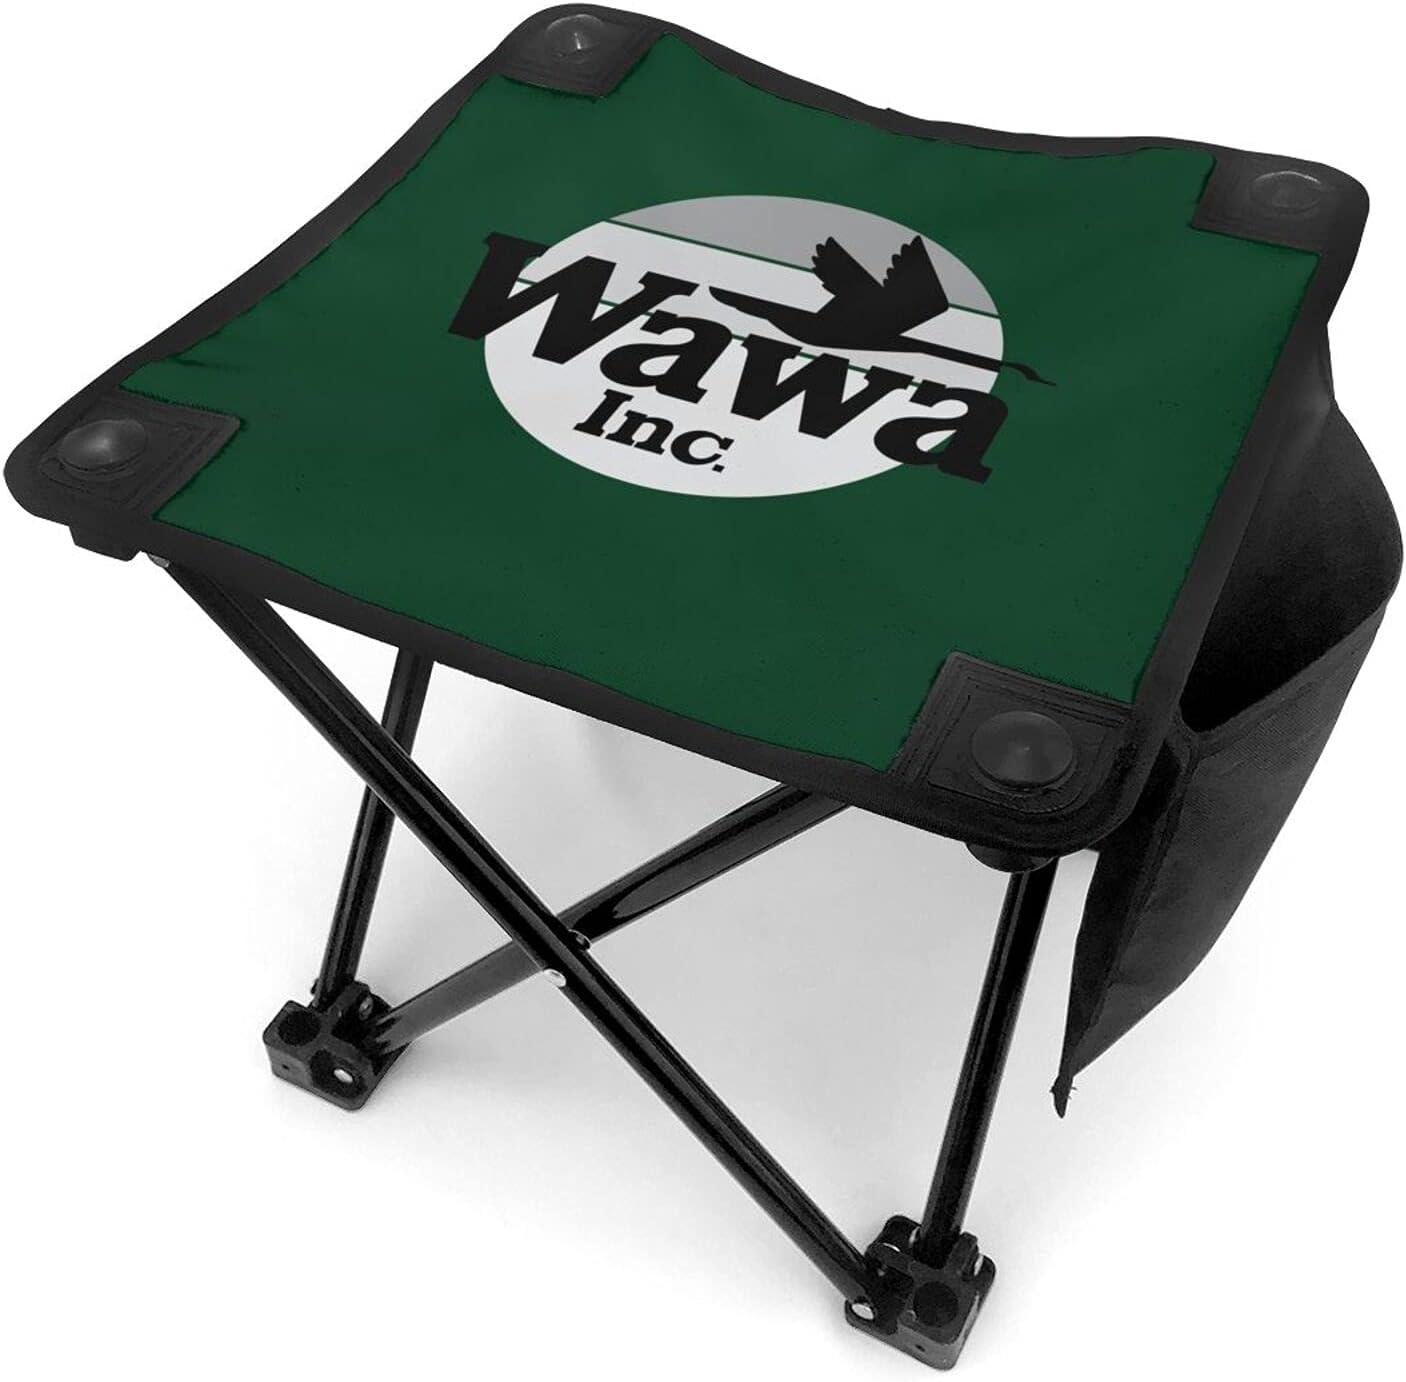 Jawn Camping Stool Ultralight Mini Stools Popular Max 47% OFF product Portable Folding